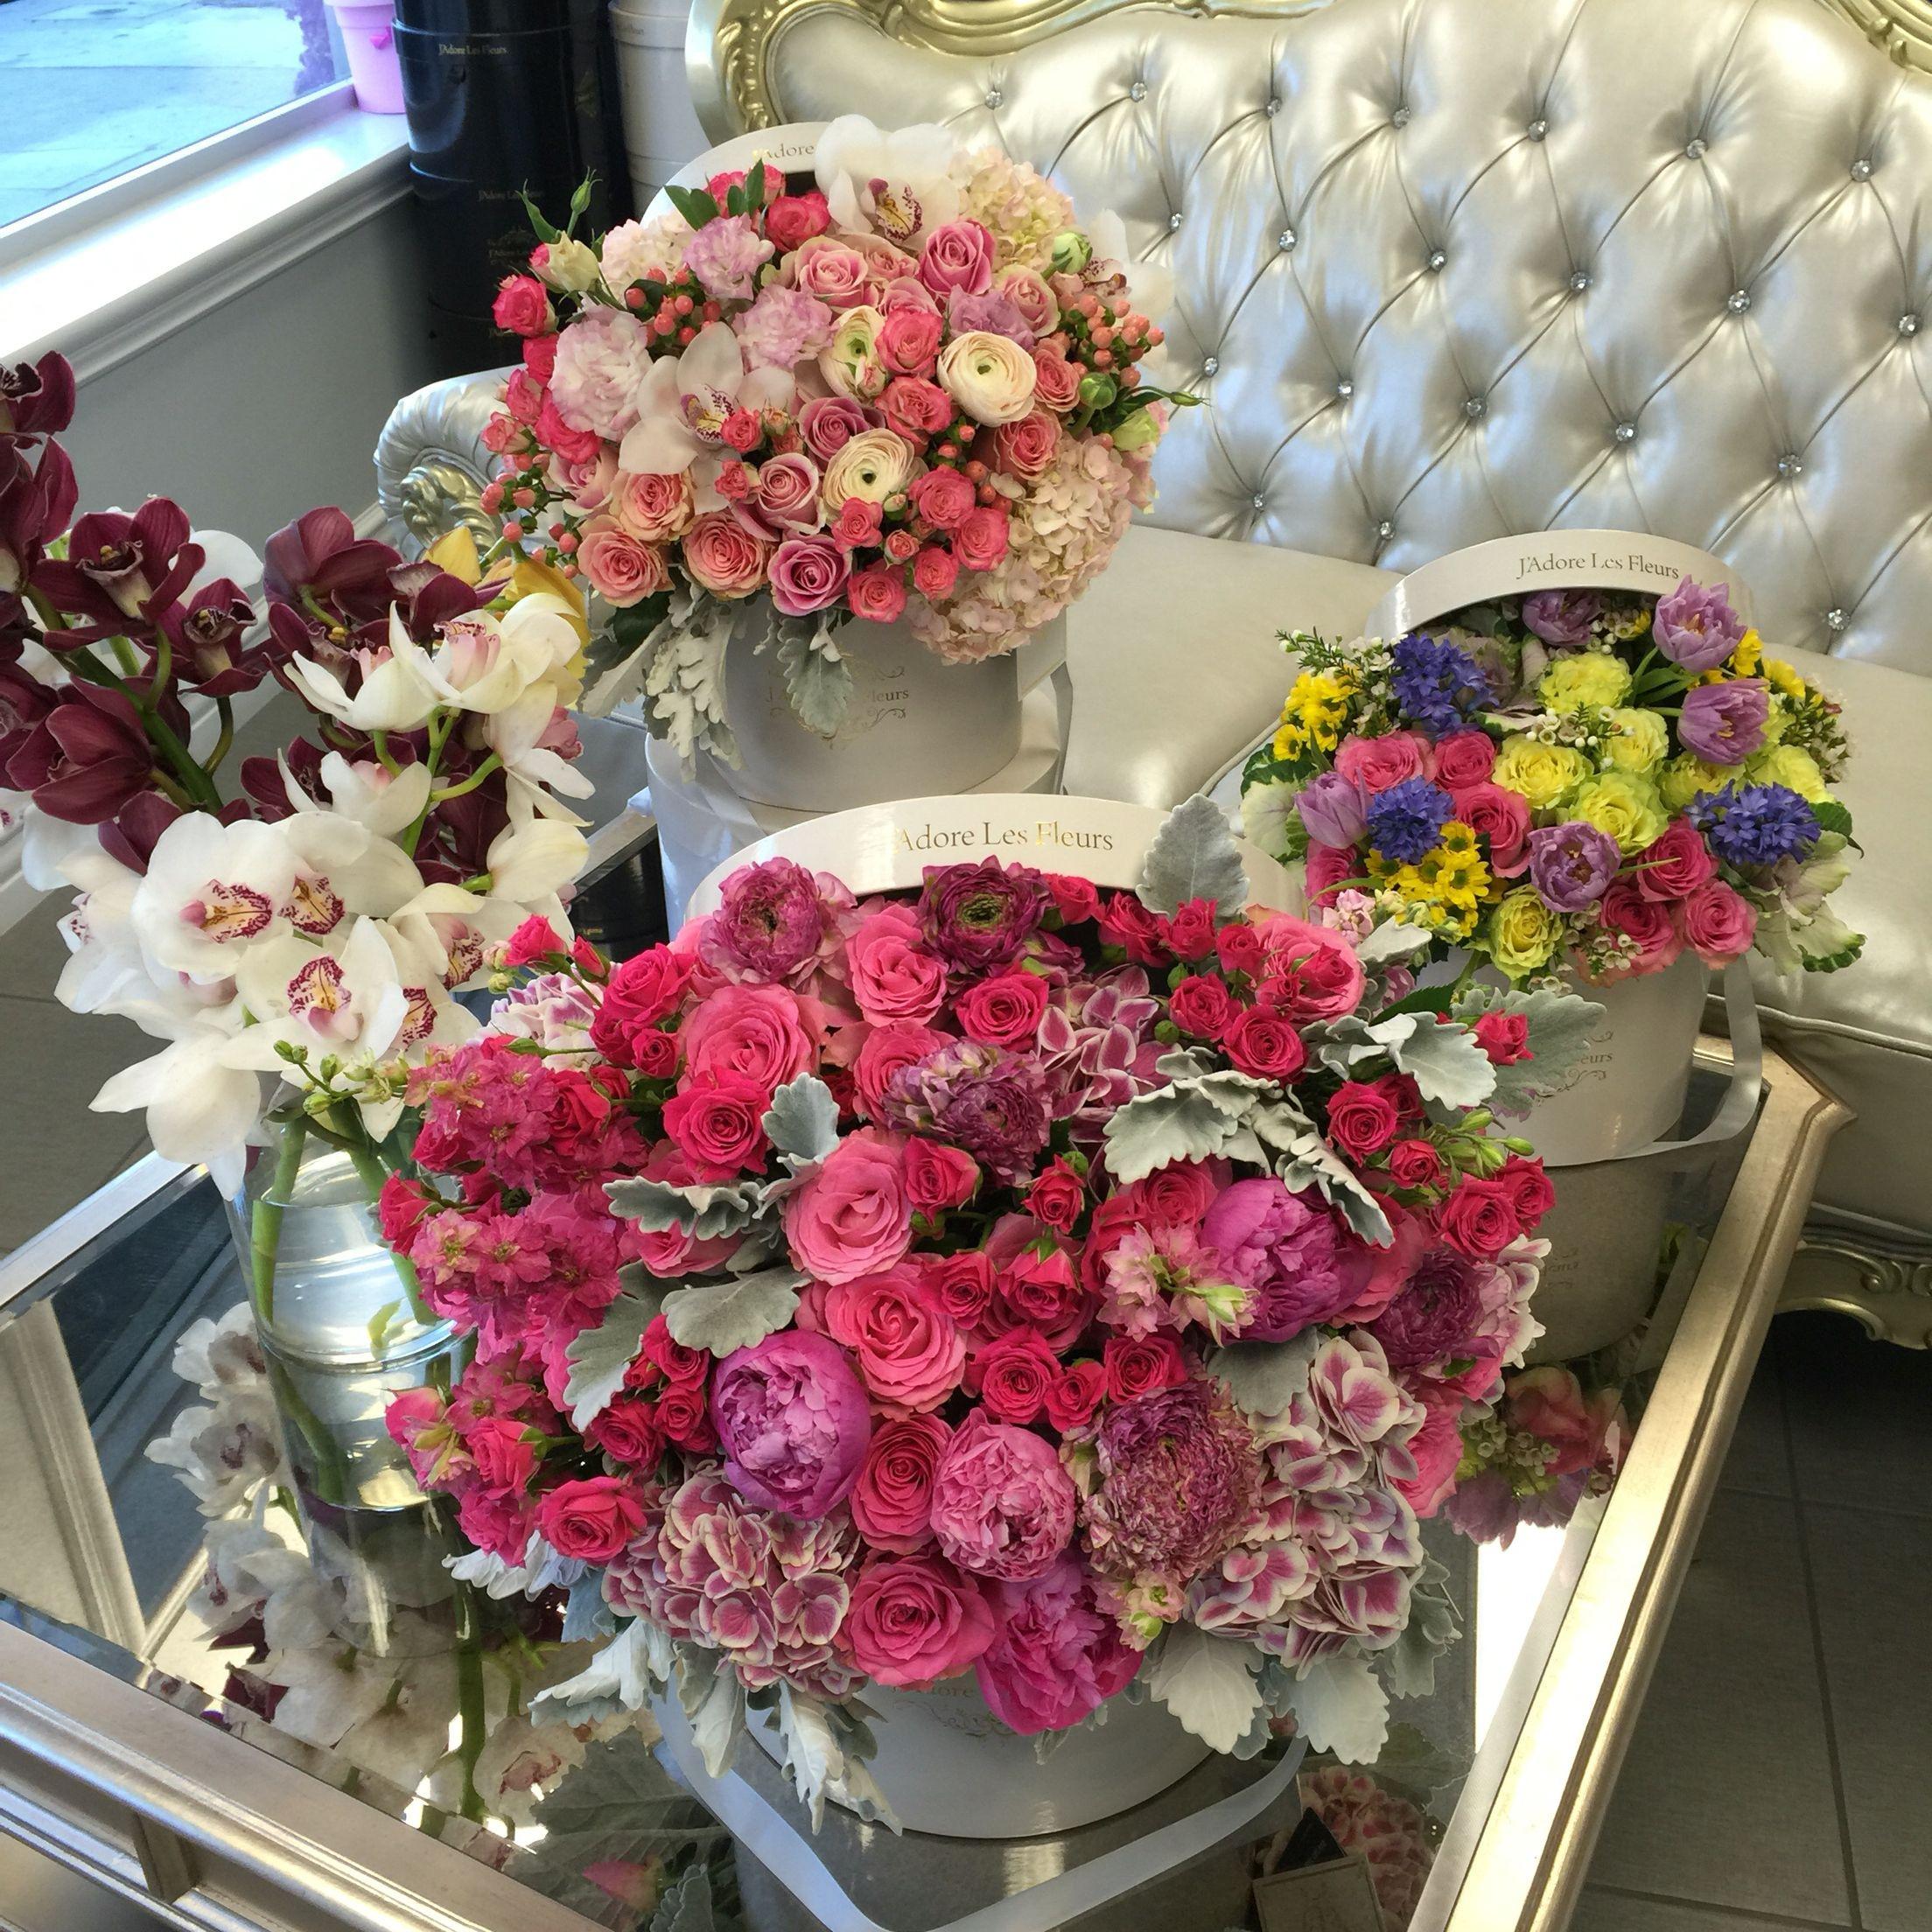 J Adore Les Fleurs arrangements